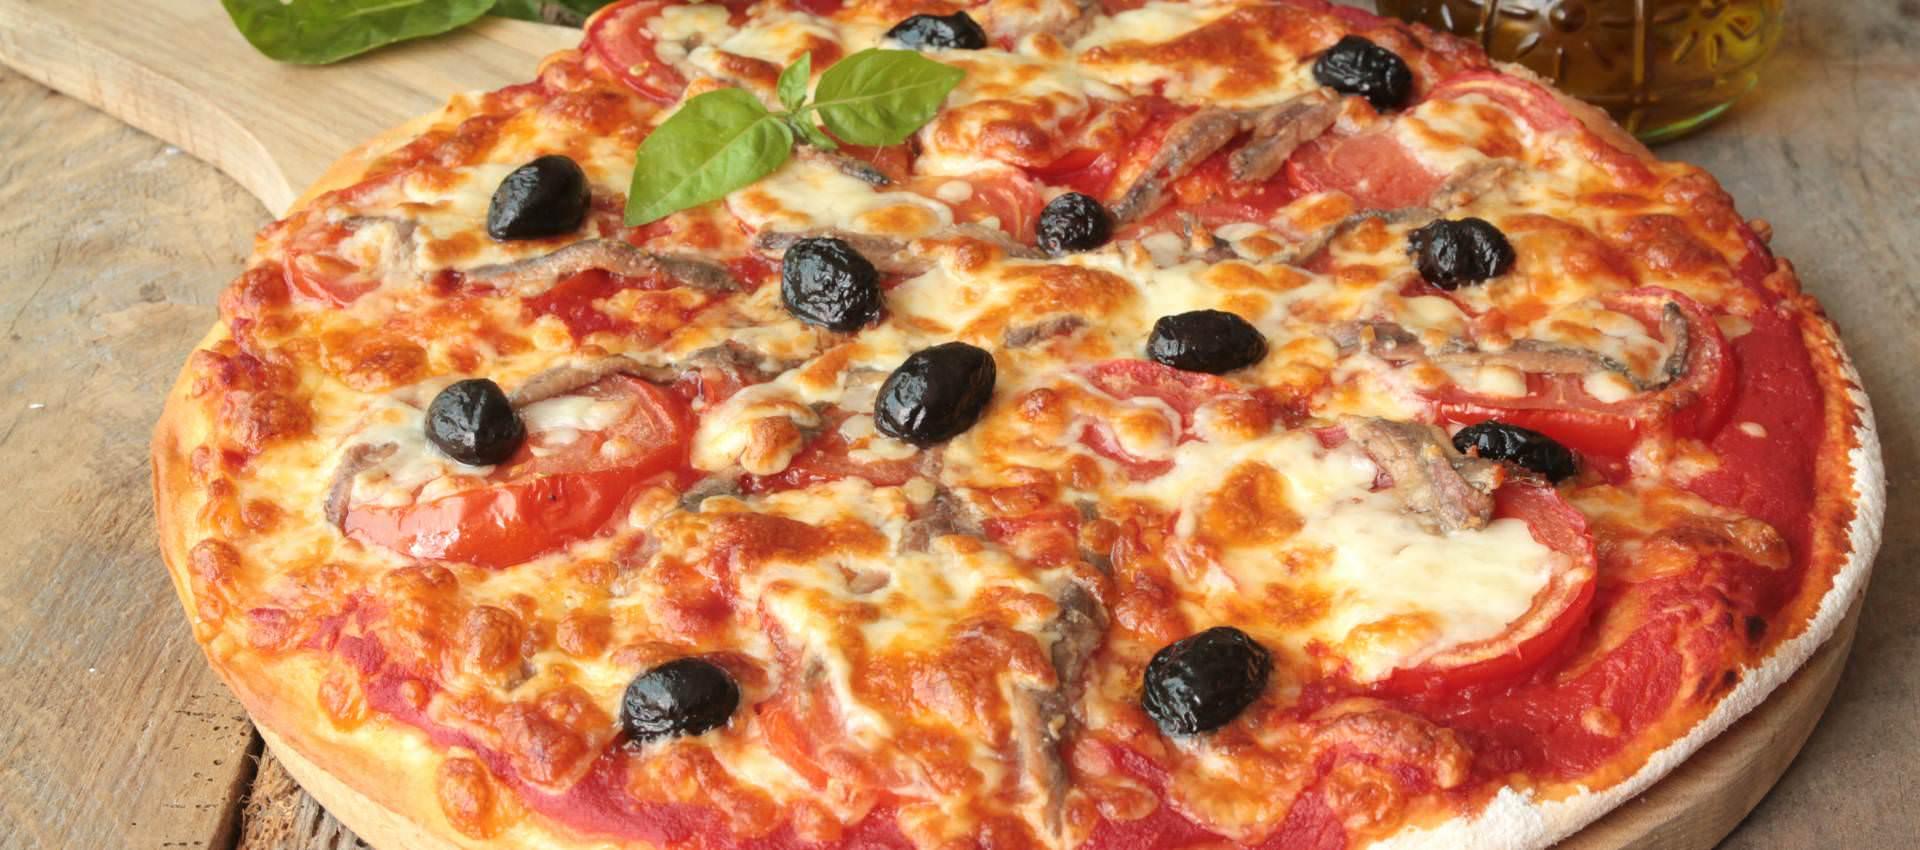 Recette de la pizza napolitaine recette italienne pizza napolitaine anchois mozarella origan - Recette de pate a pizza italienne ...